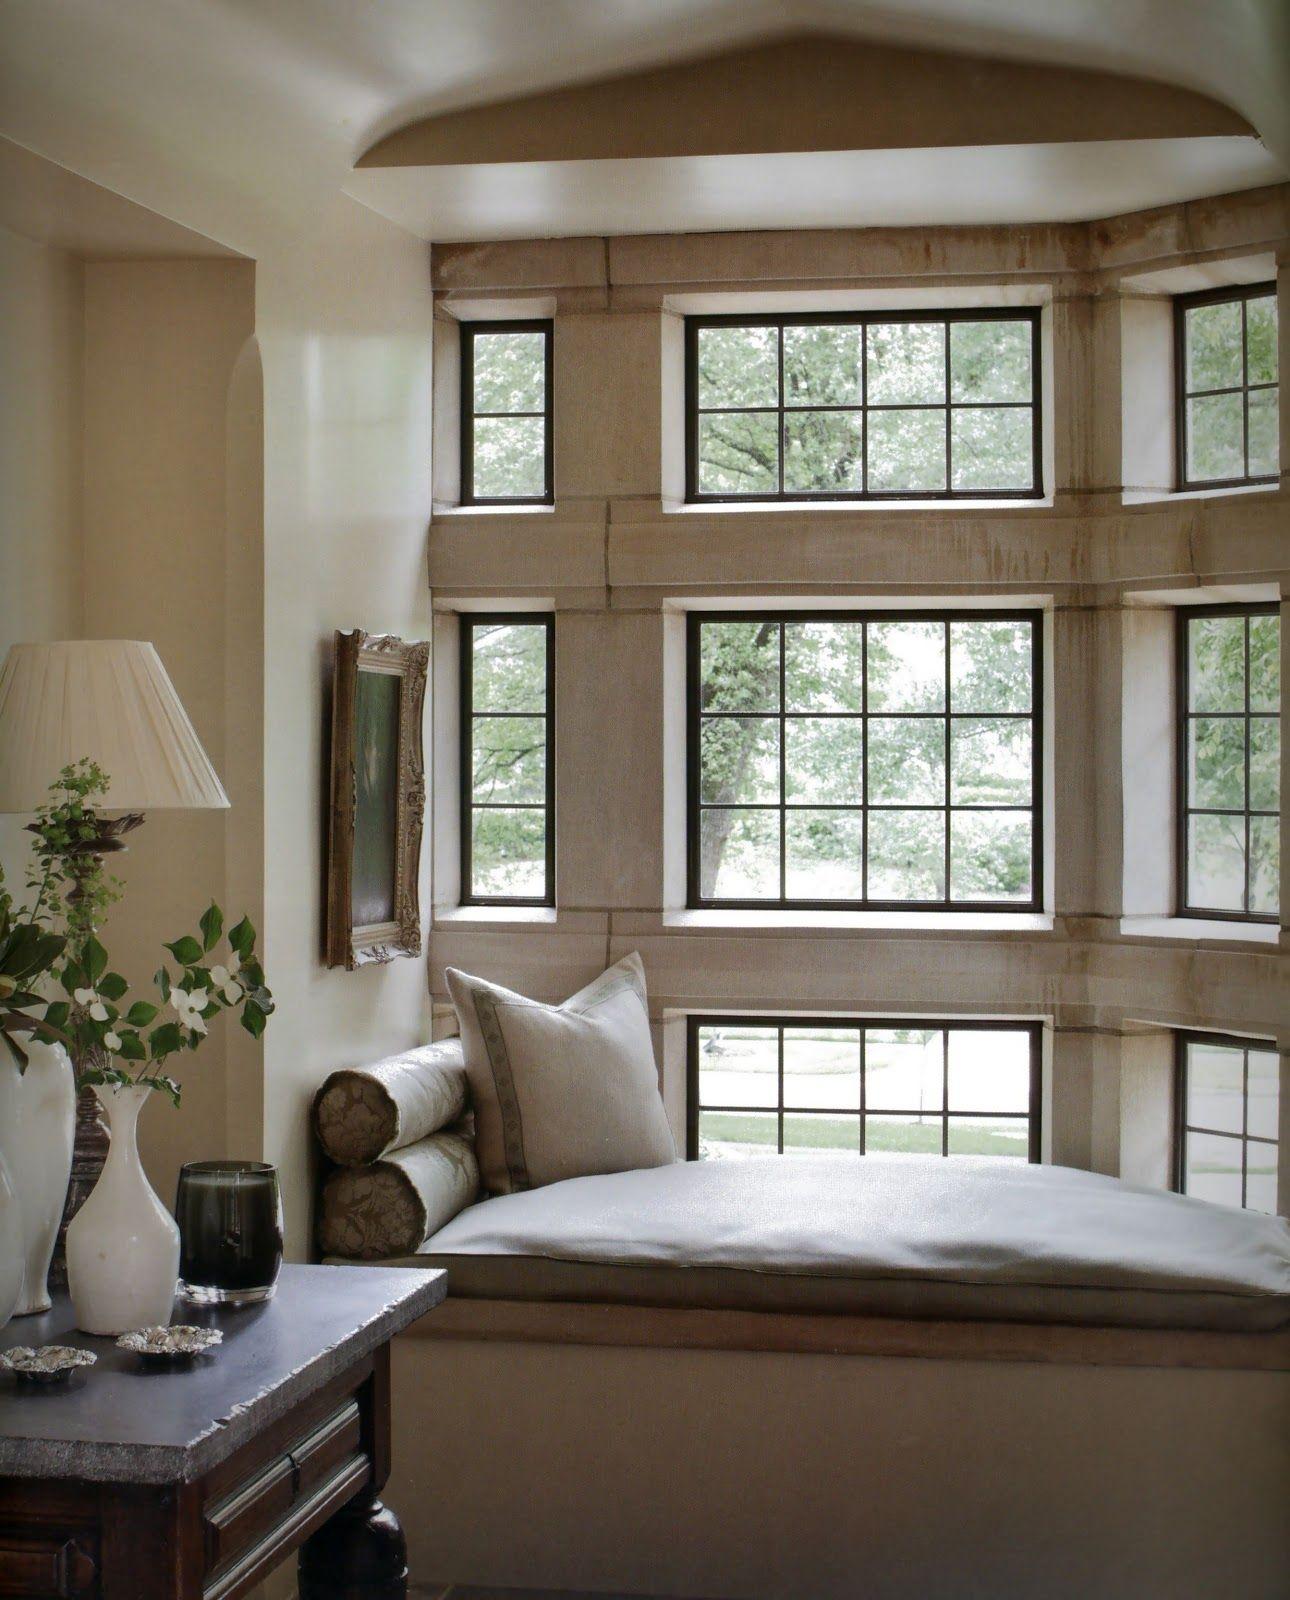 Window house design ideas  window seat  home sweet home  pinterest  window house and